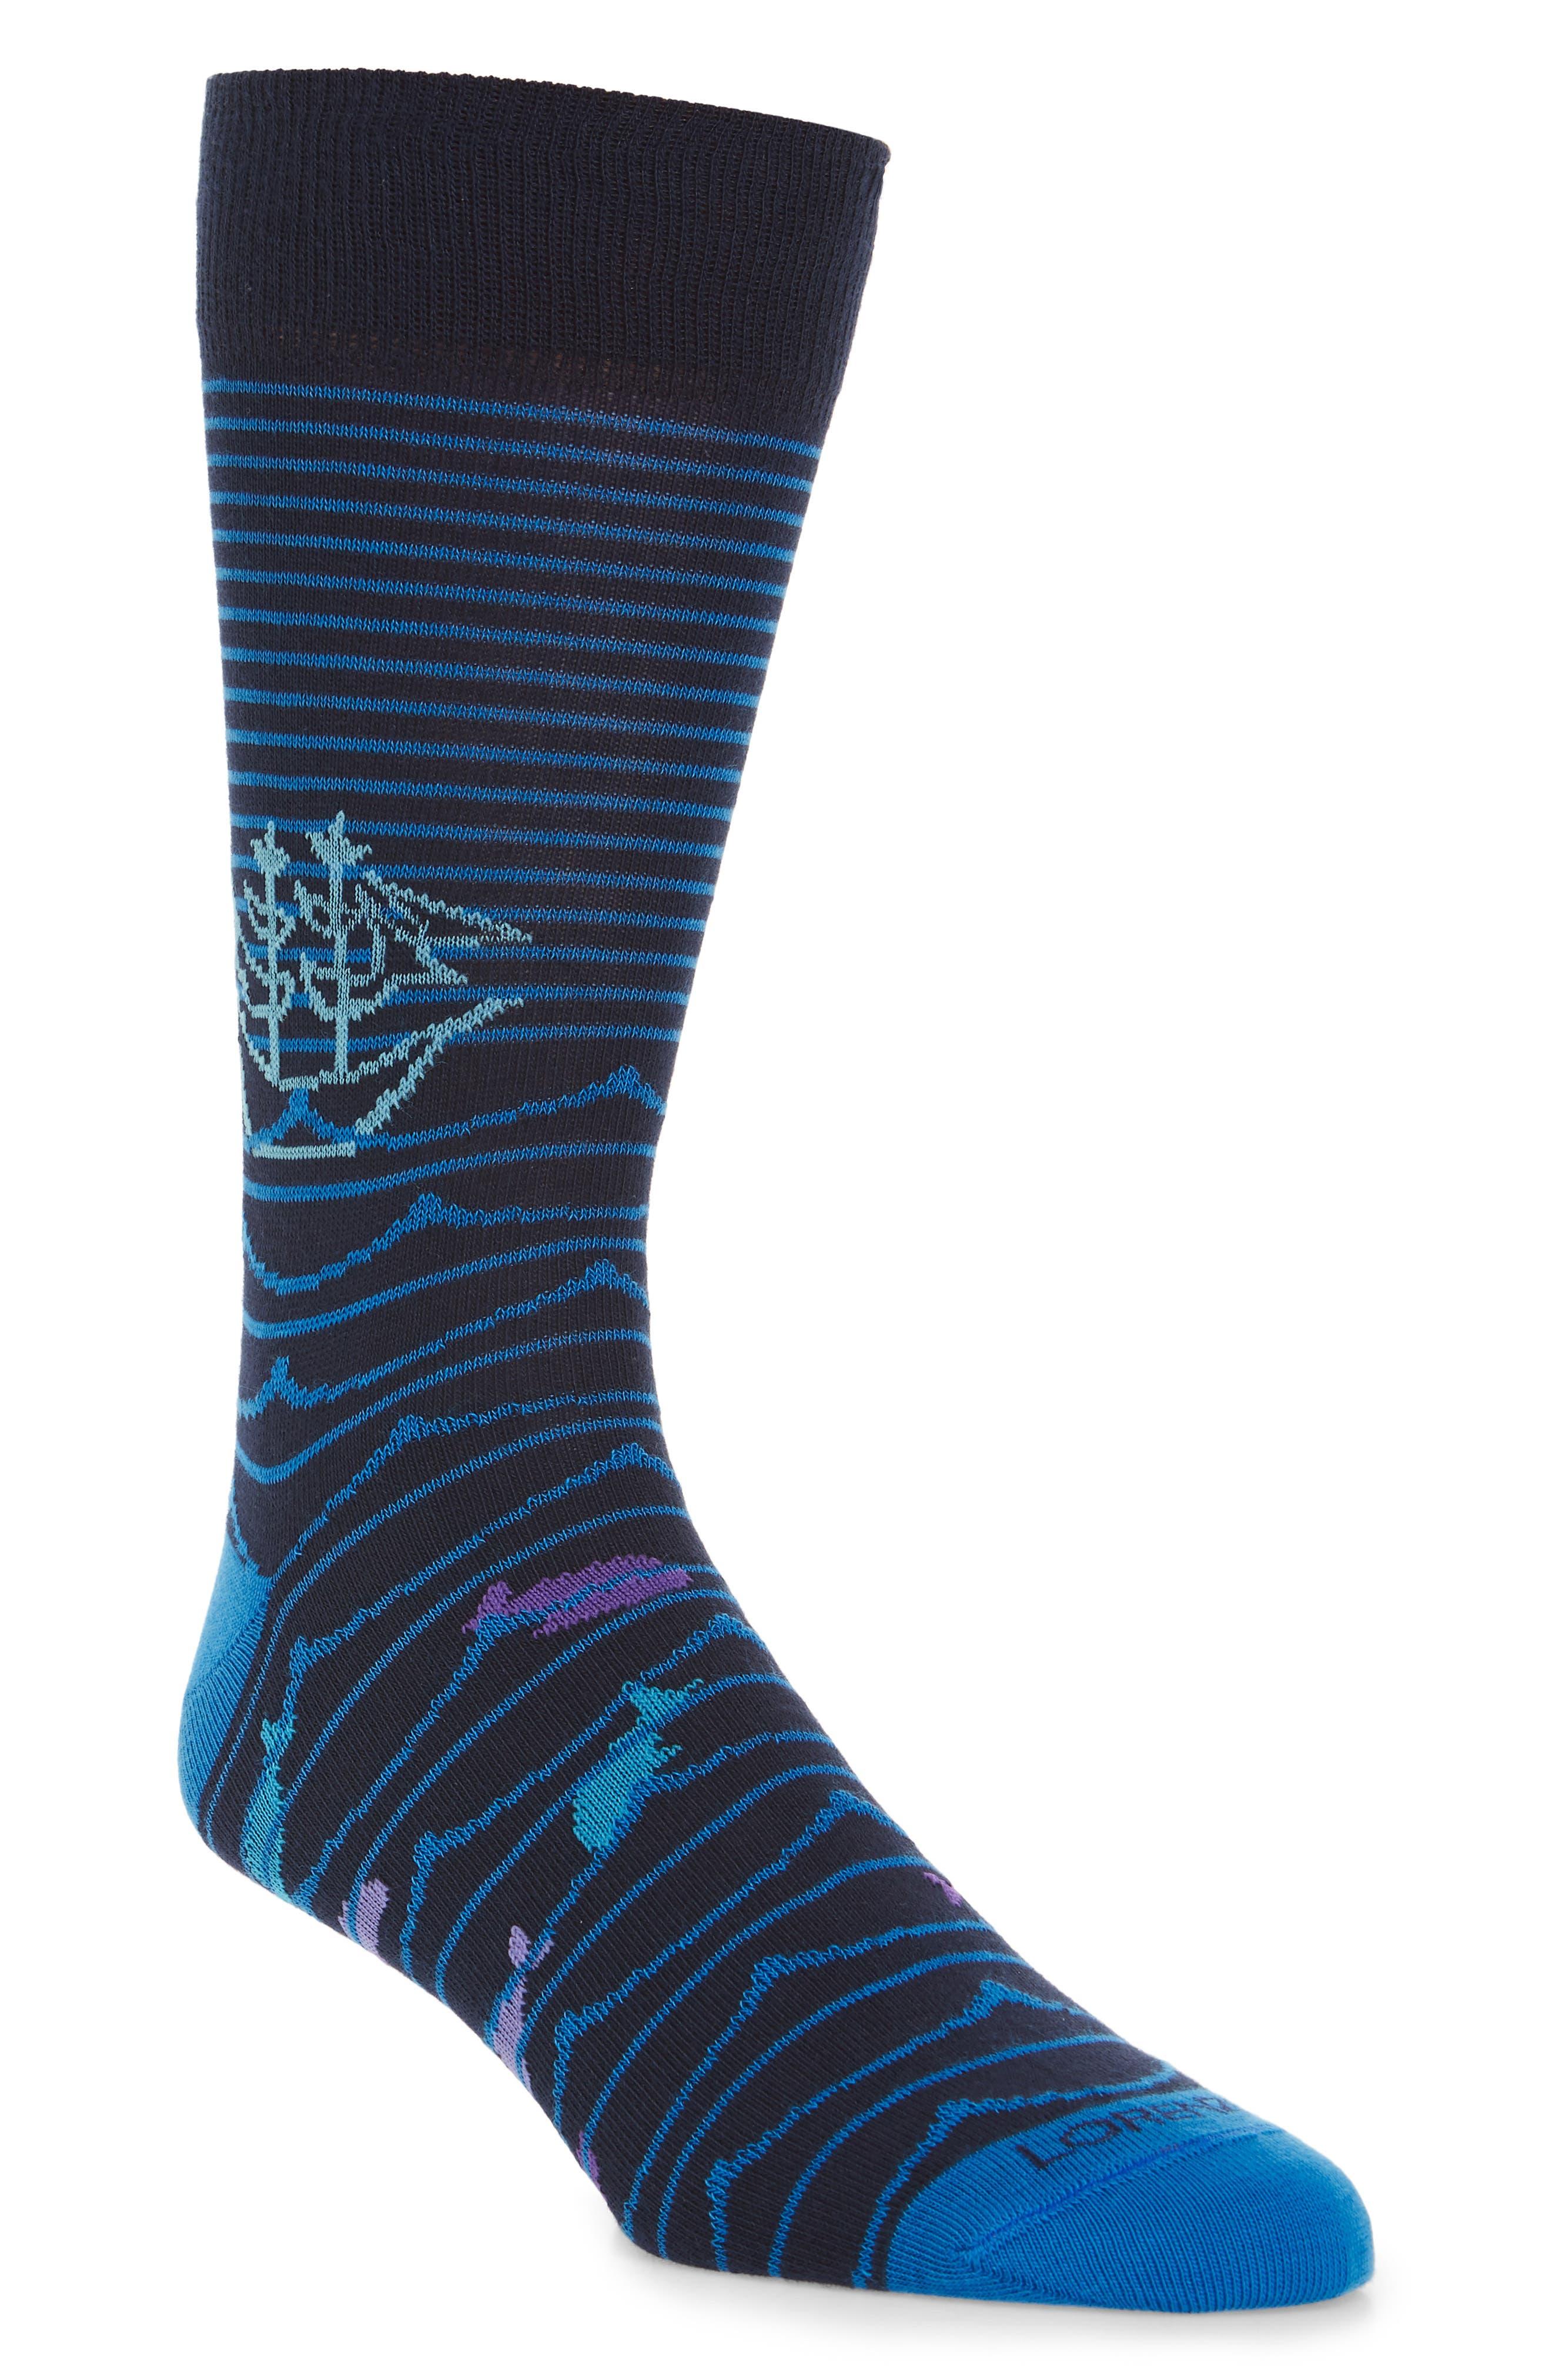 Pirate Ship Socks,                         Main,                         color,